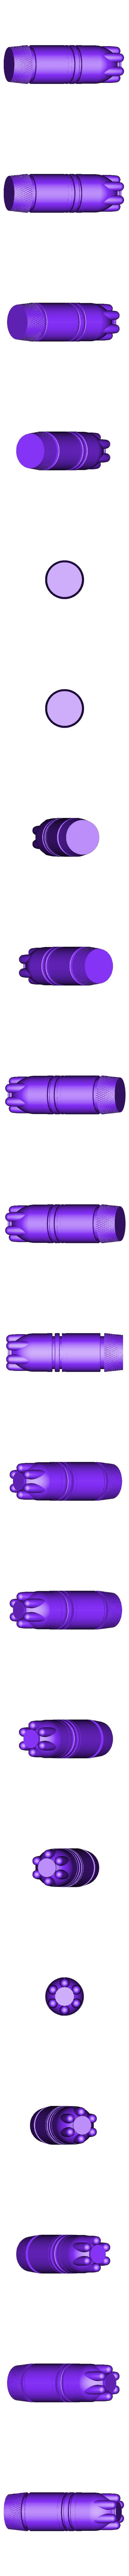 glue_grenade.STL Download 3MF file Glue grenade from the video game Batman: Arkham Origins • 3D printer model, vetrock